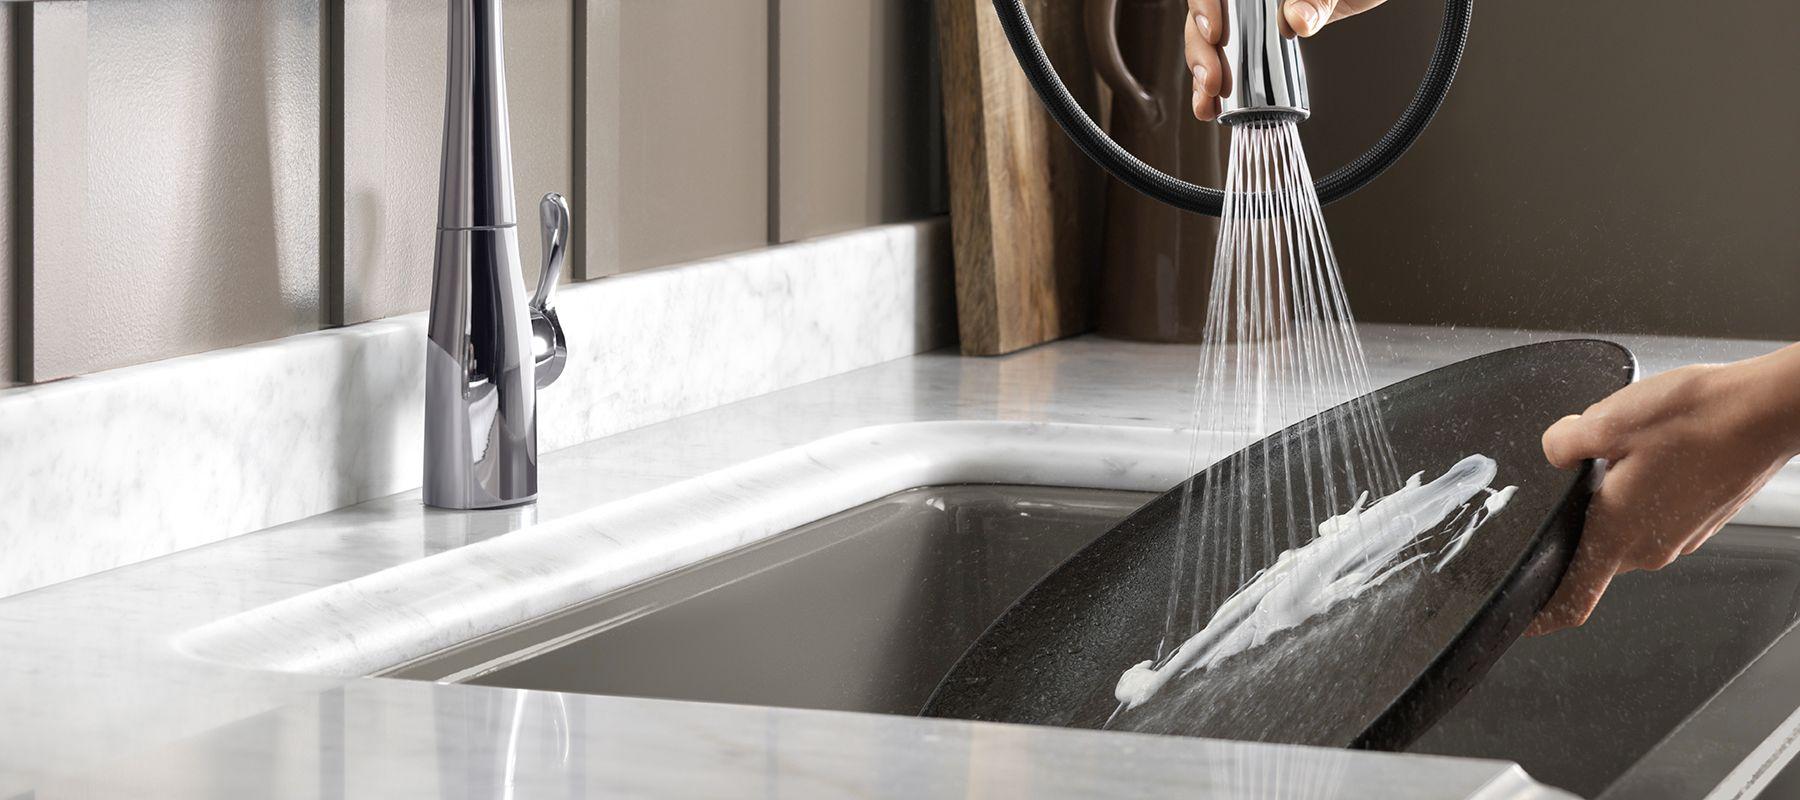 Kitchen Sink Faucets Kitchen Faucets Kitchen Kohler